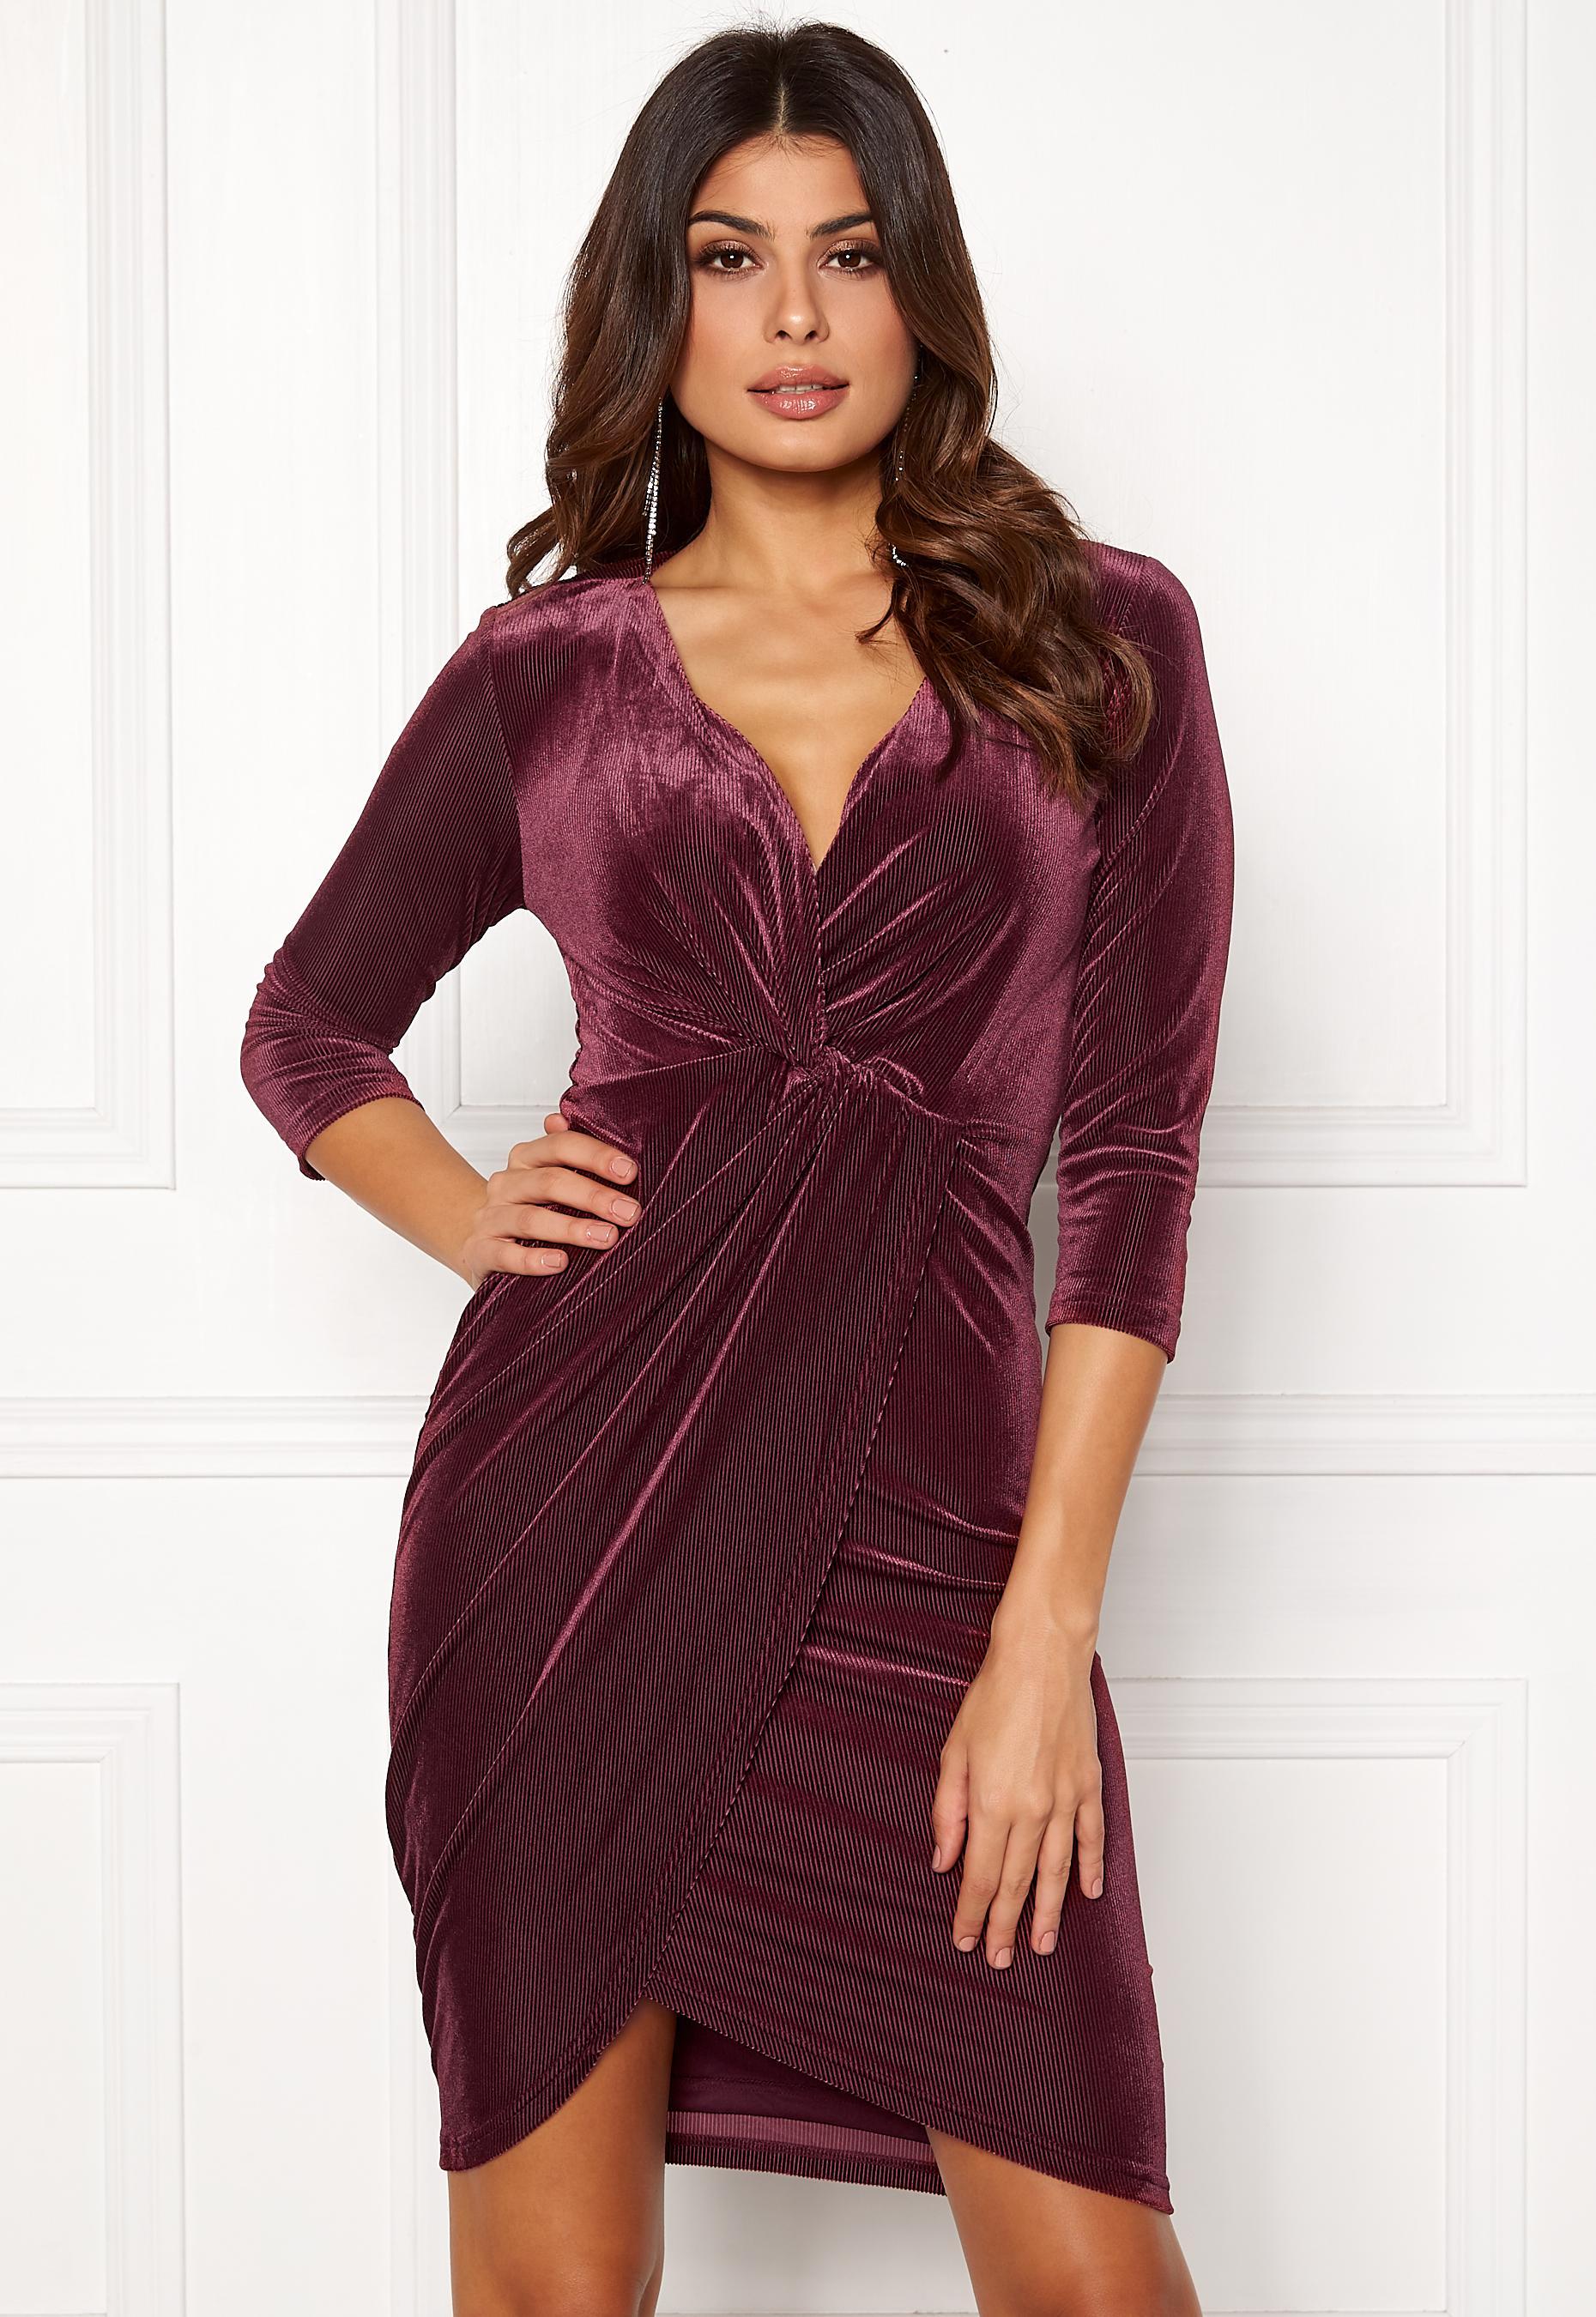 DRY LAKE Angelina Dress 608 Burgundy - Bubbleroom fe9b82c6cc87a